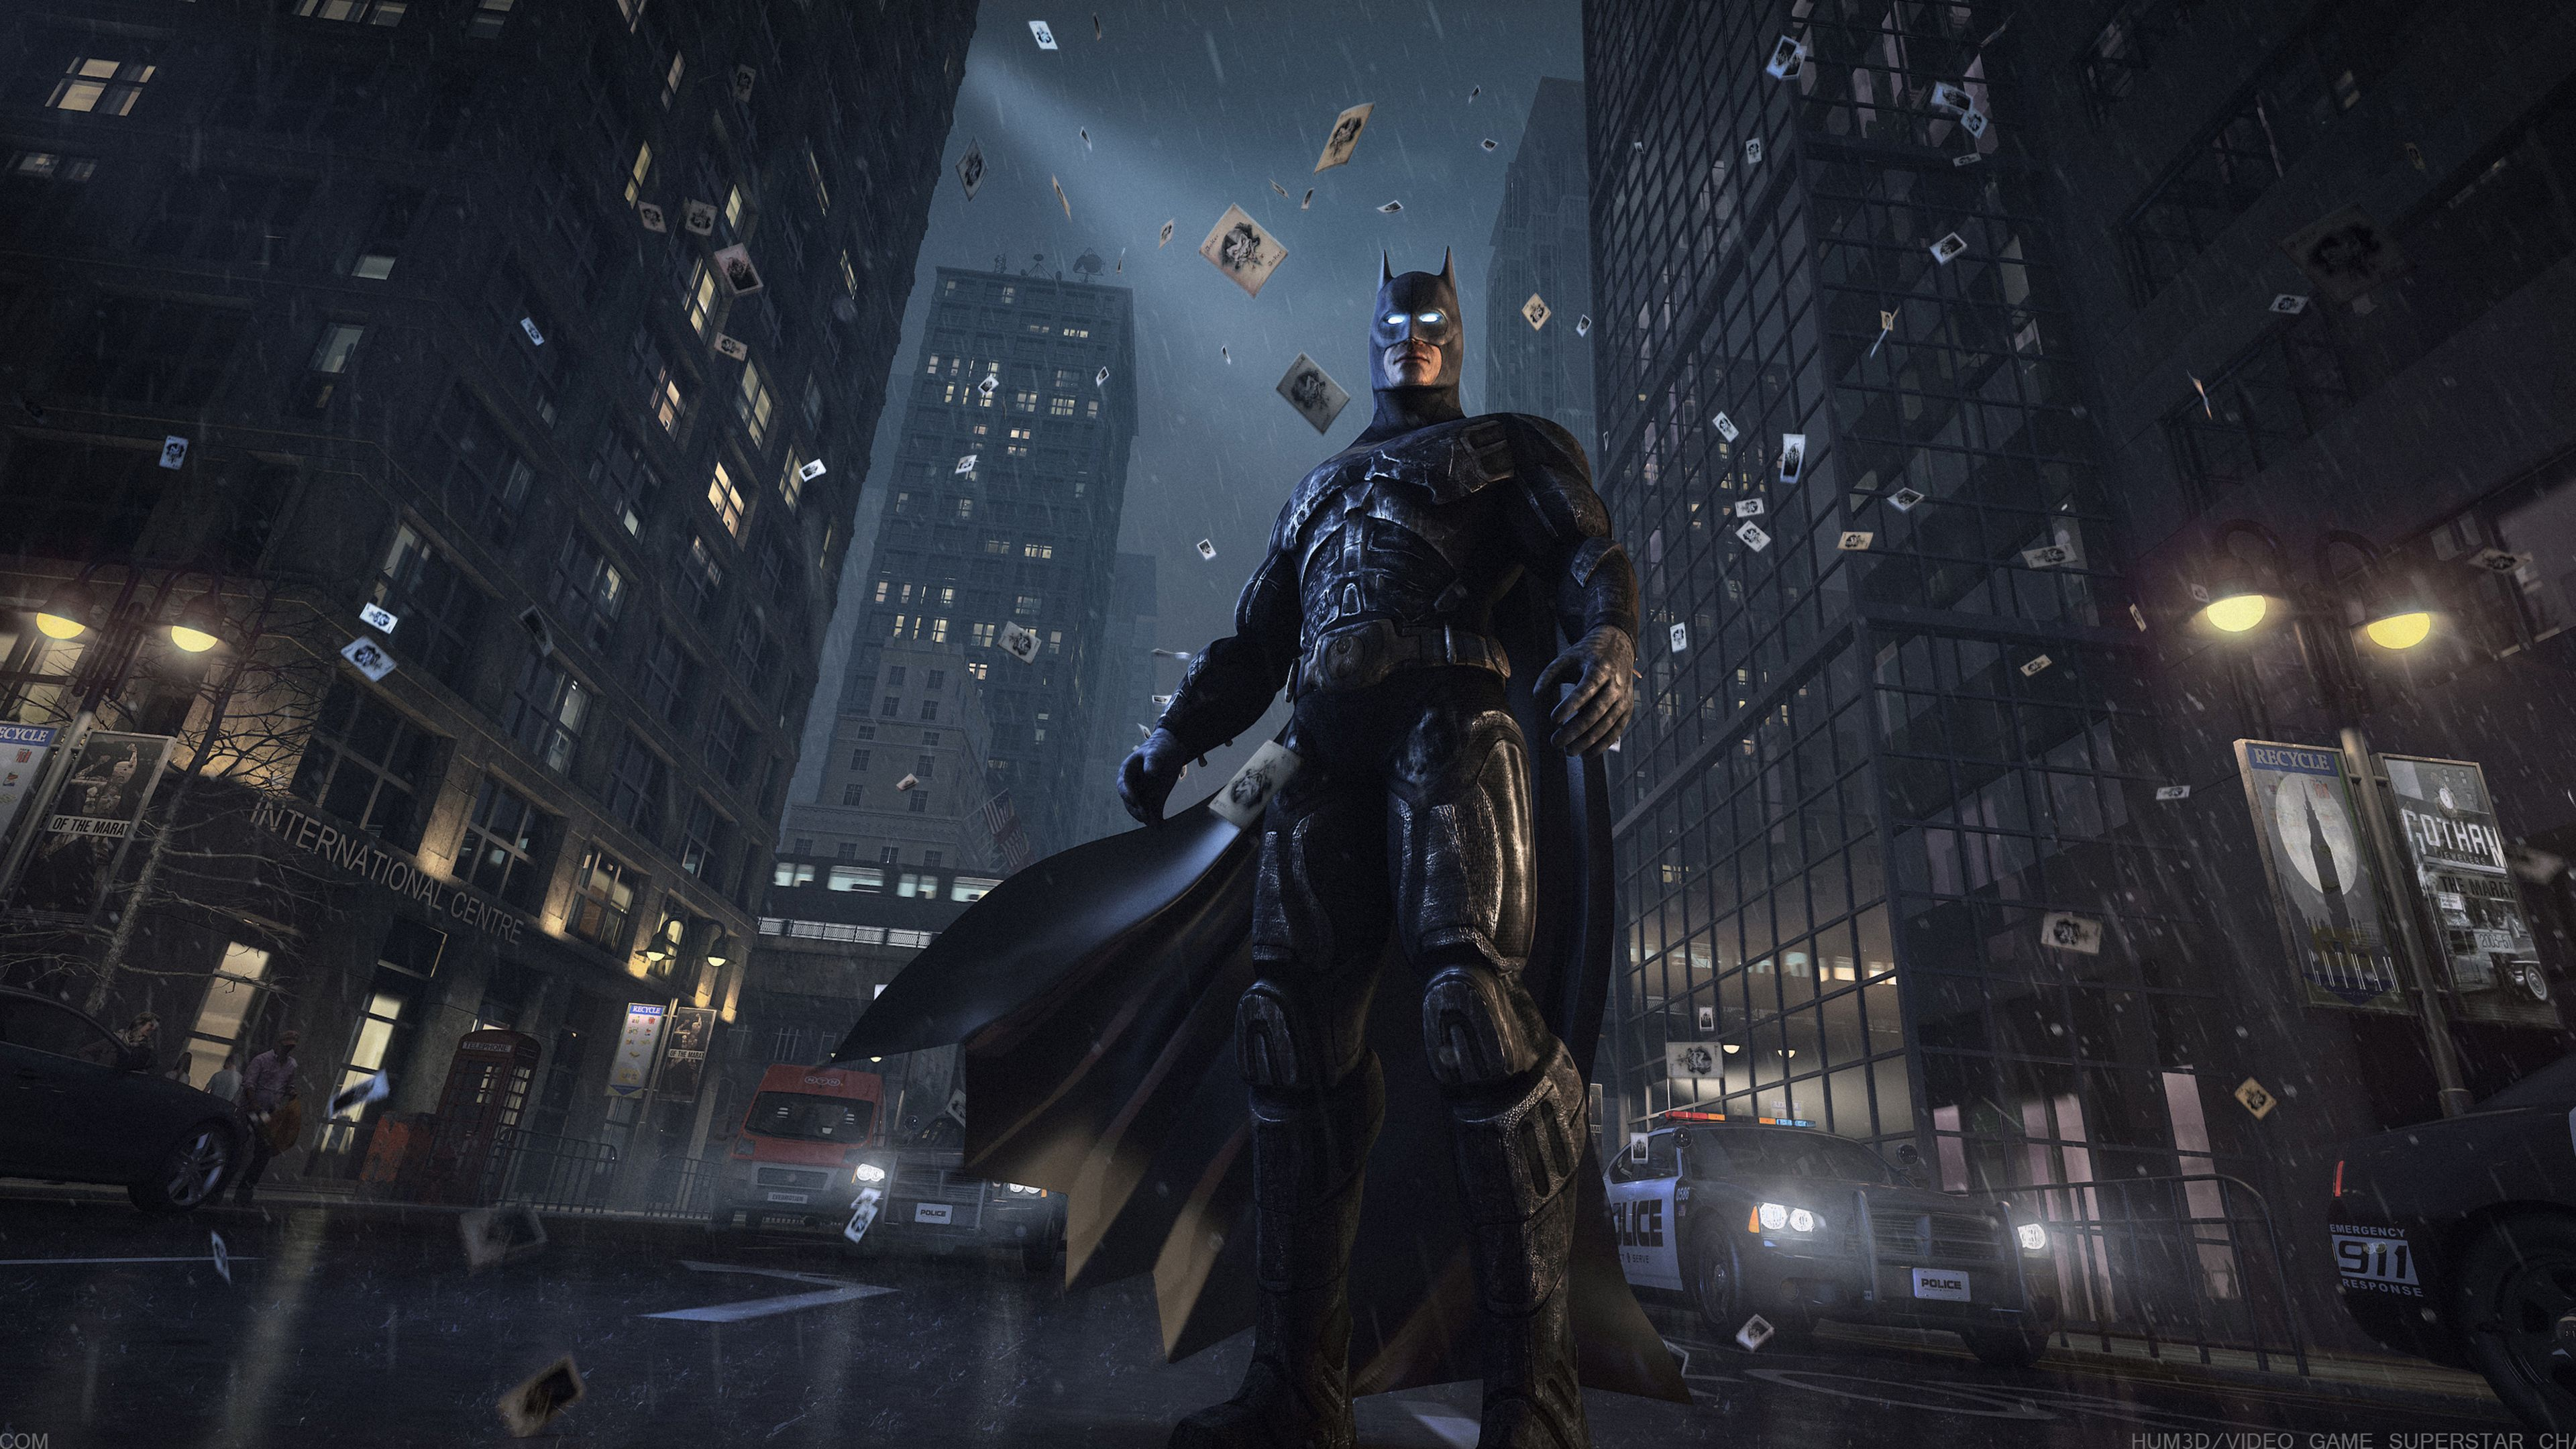 Wallpaper 4k Batman Watching Gotham City 4kwallpapers